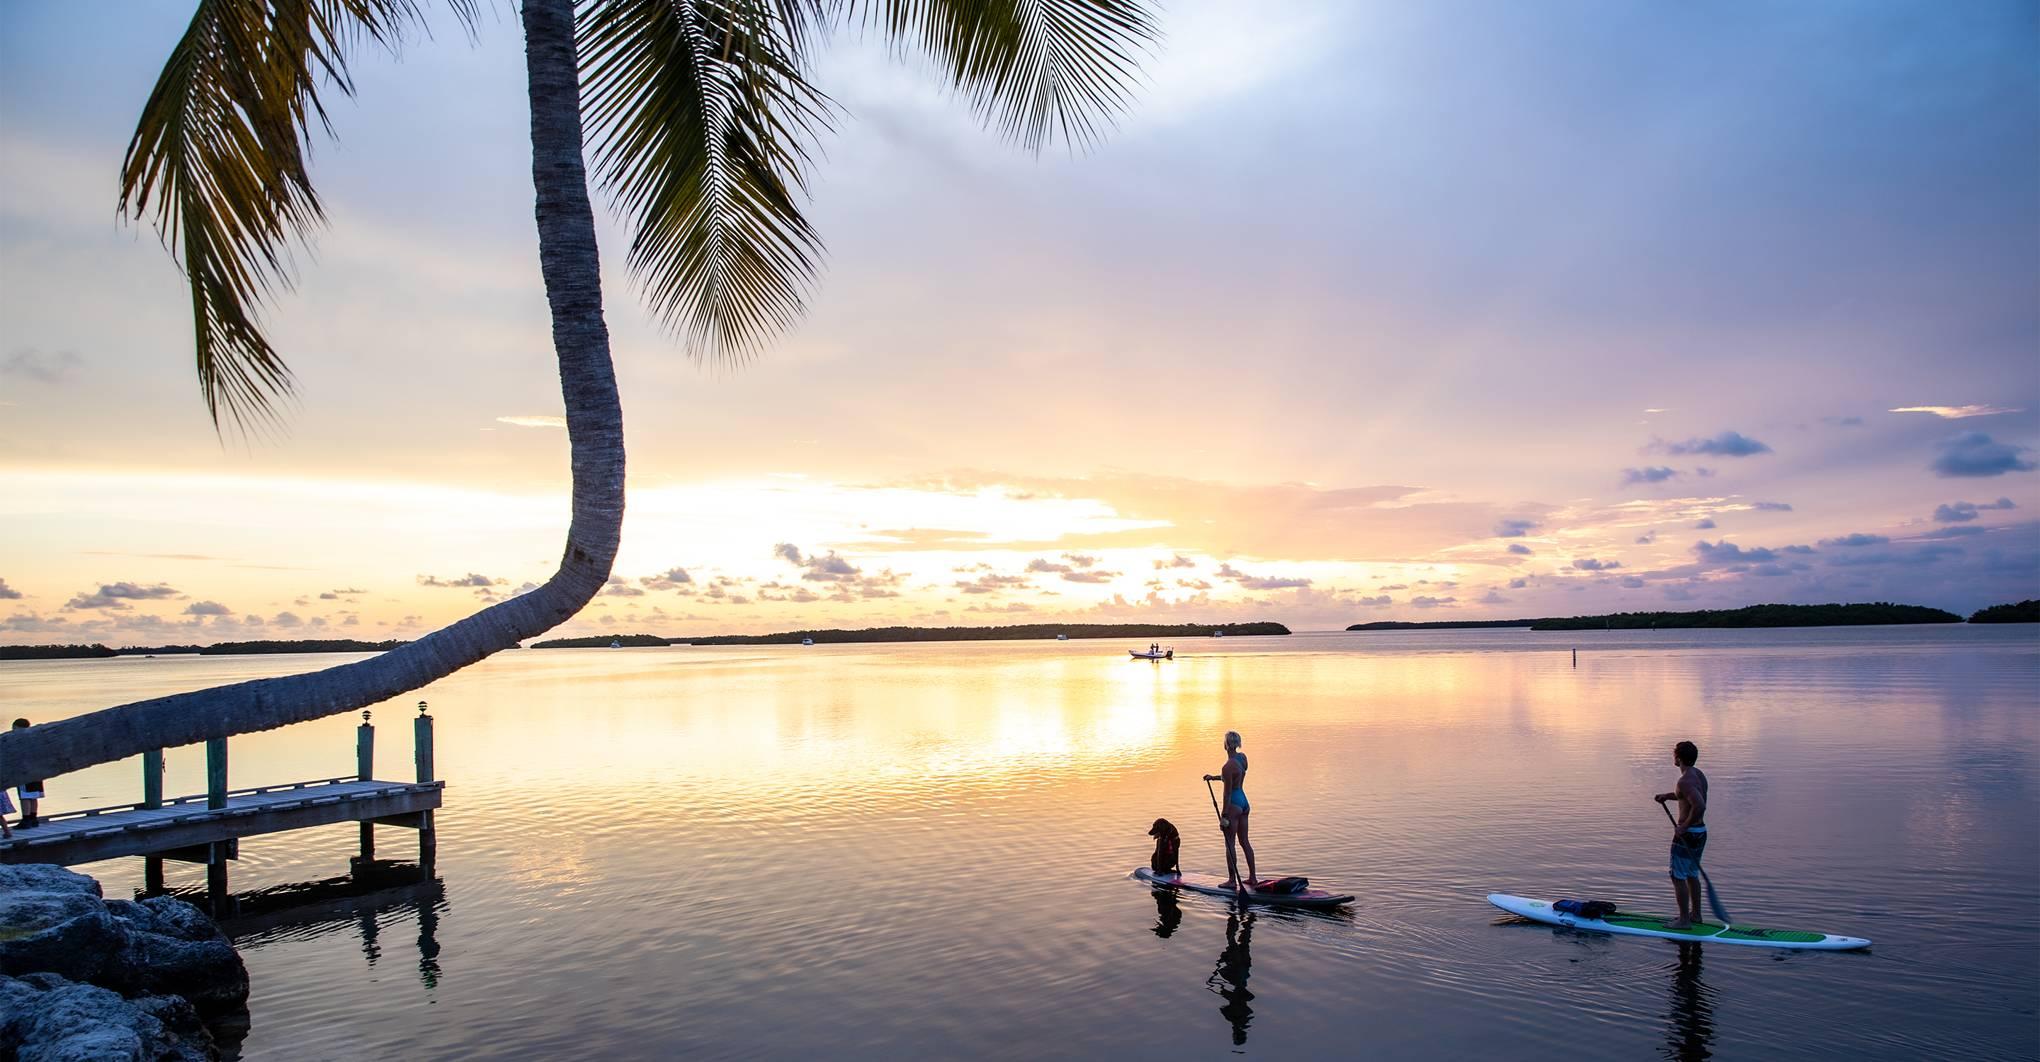 9 amazing islands in the Florida Keys